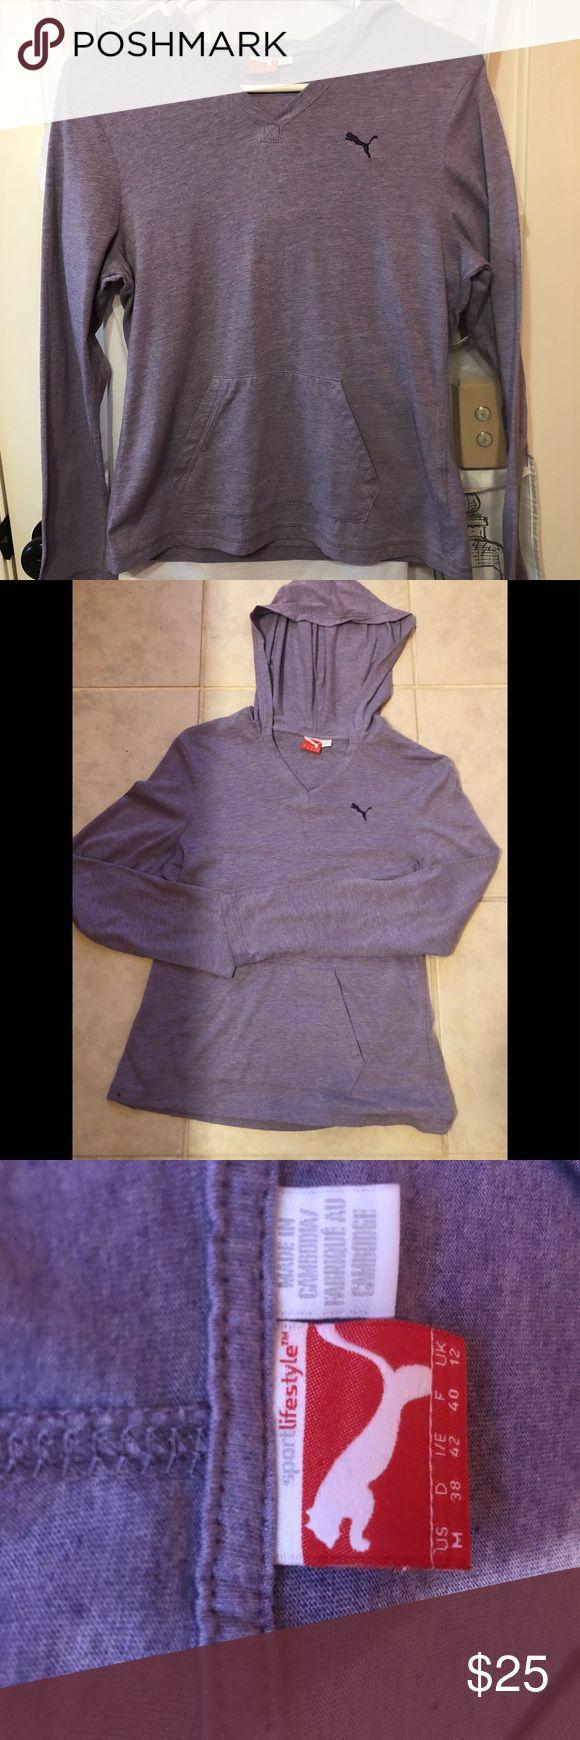 Puma sport lifestyle hoodie. Puma Lifestyle hoodie  purple size medium Puma Shirts & Tops Sweatshirts & Hoodies